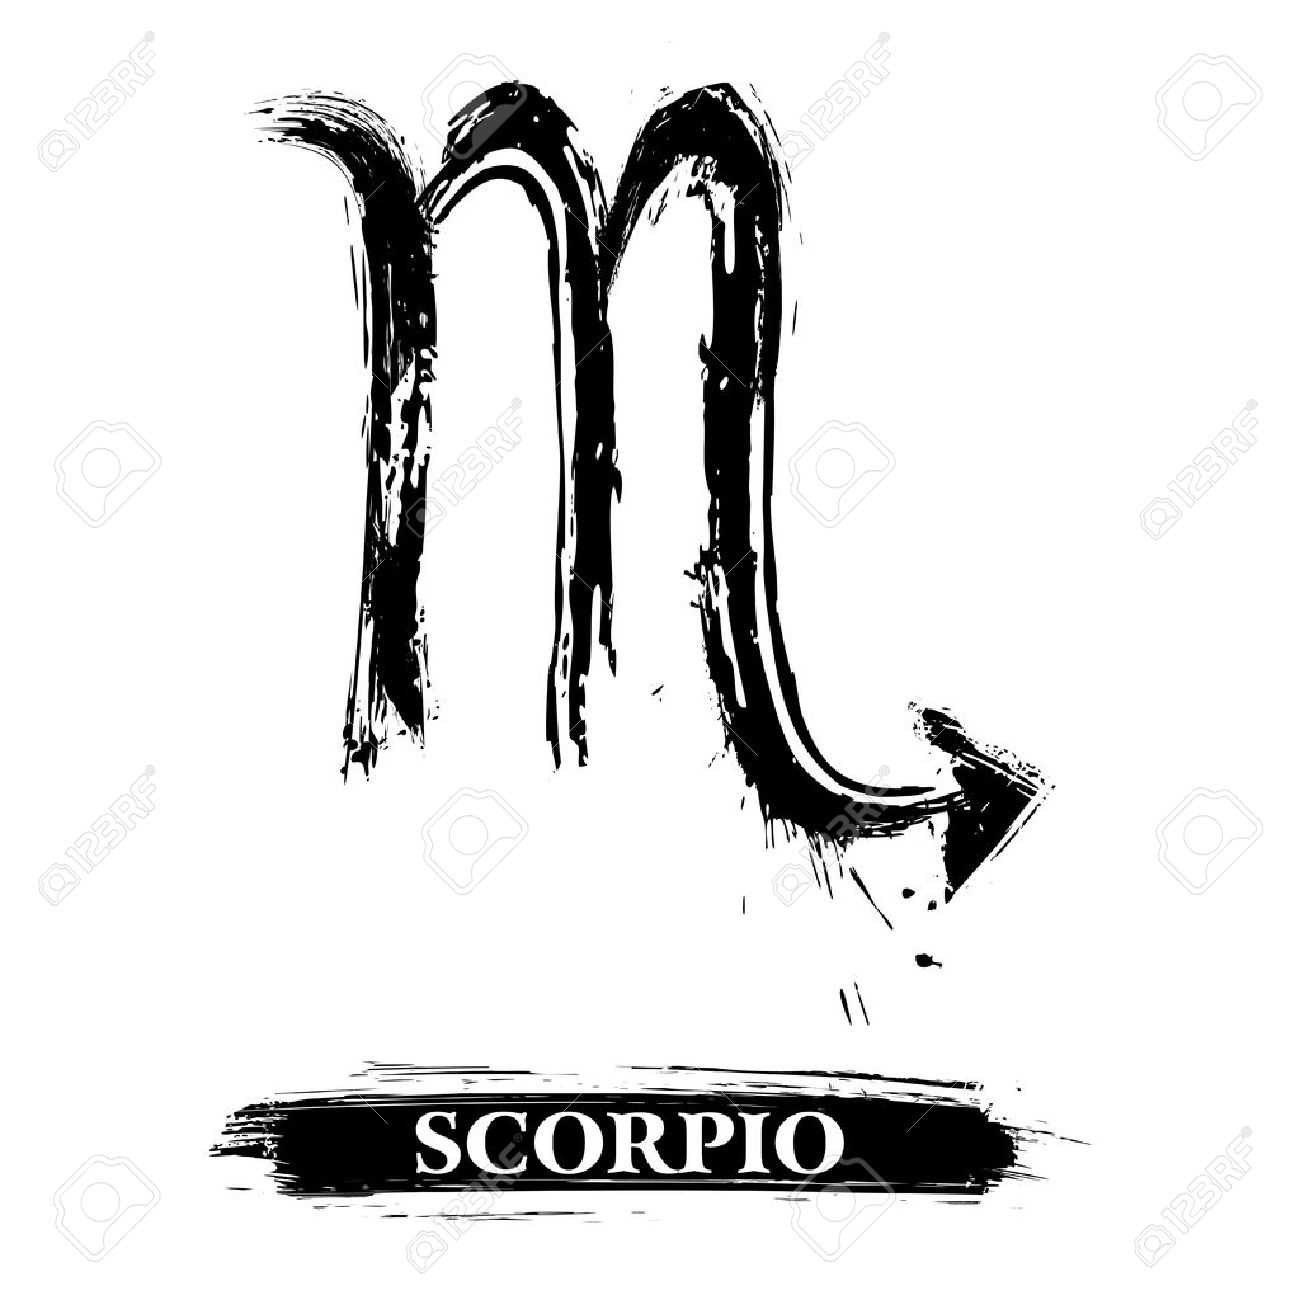 Scorpio symbol Stock Vector - 16550316